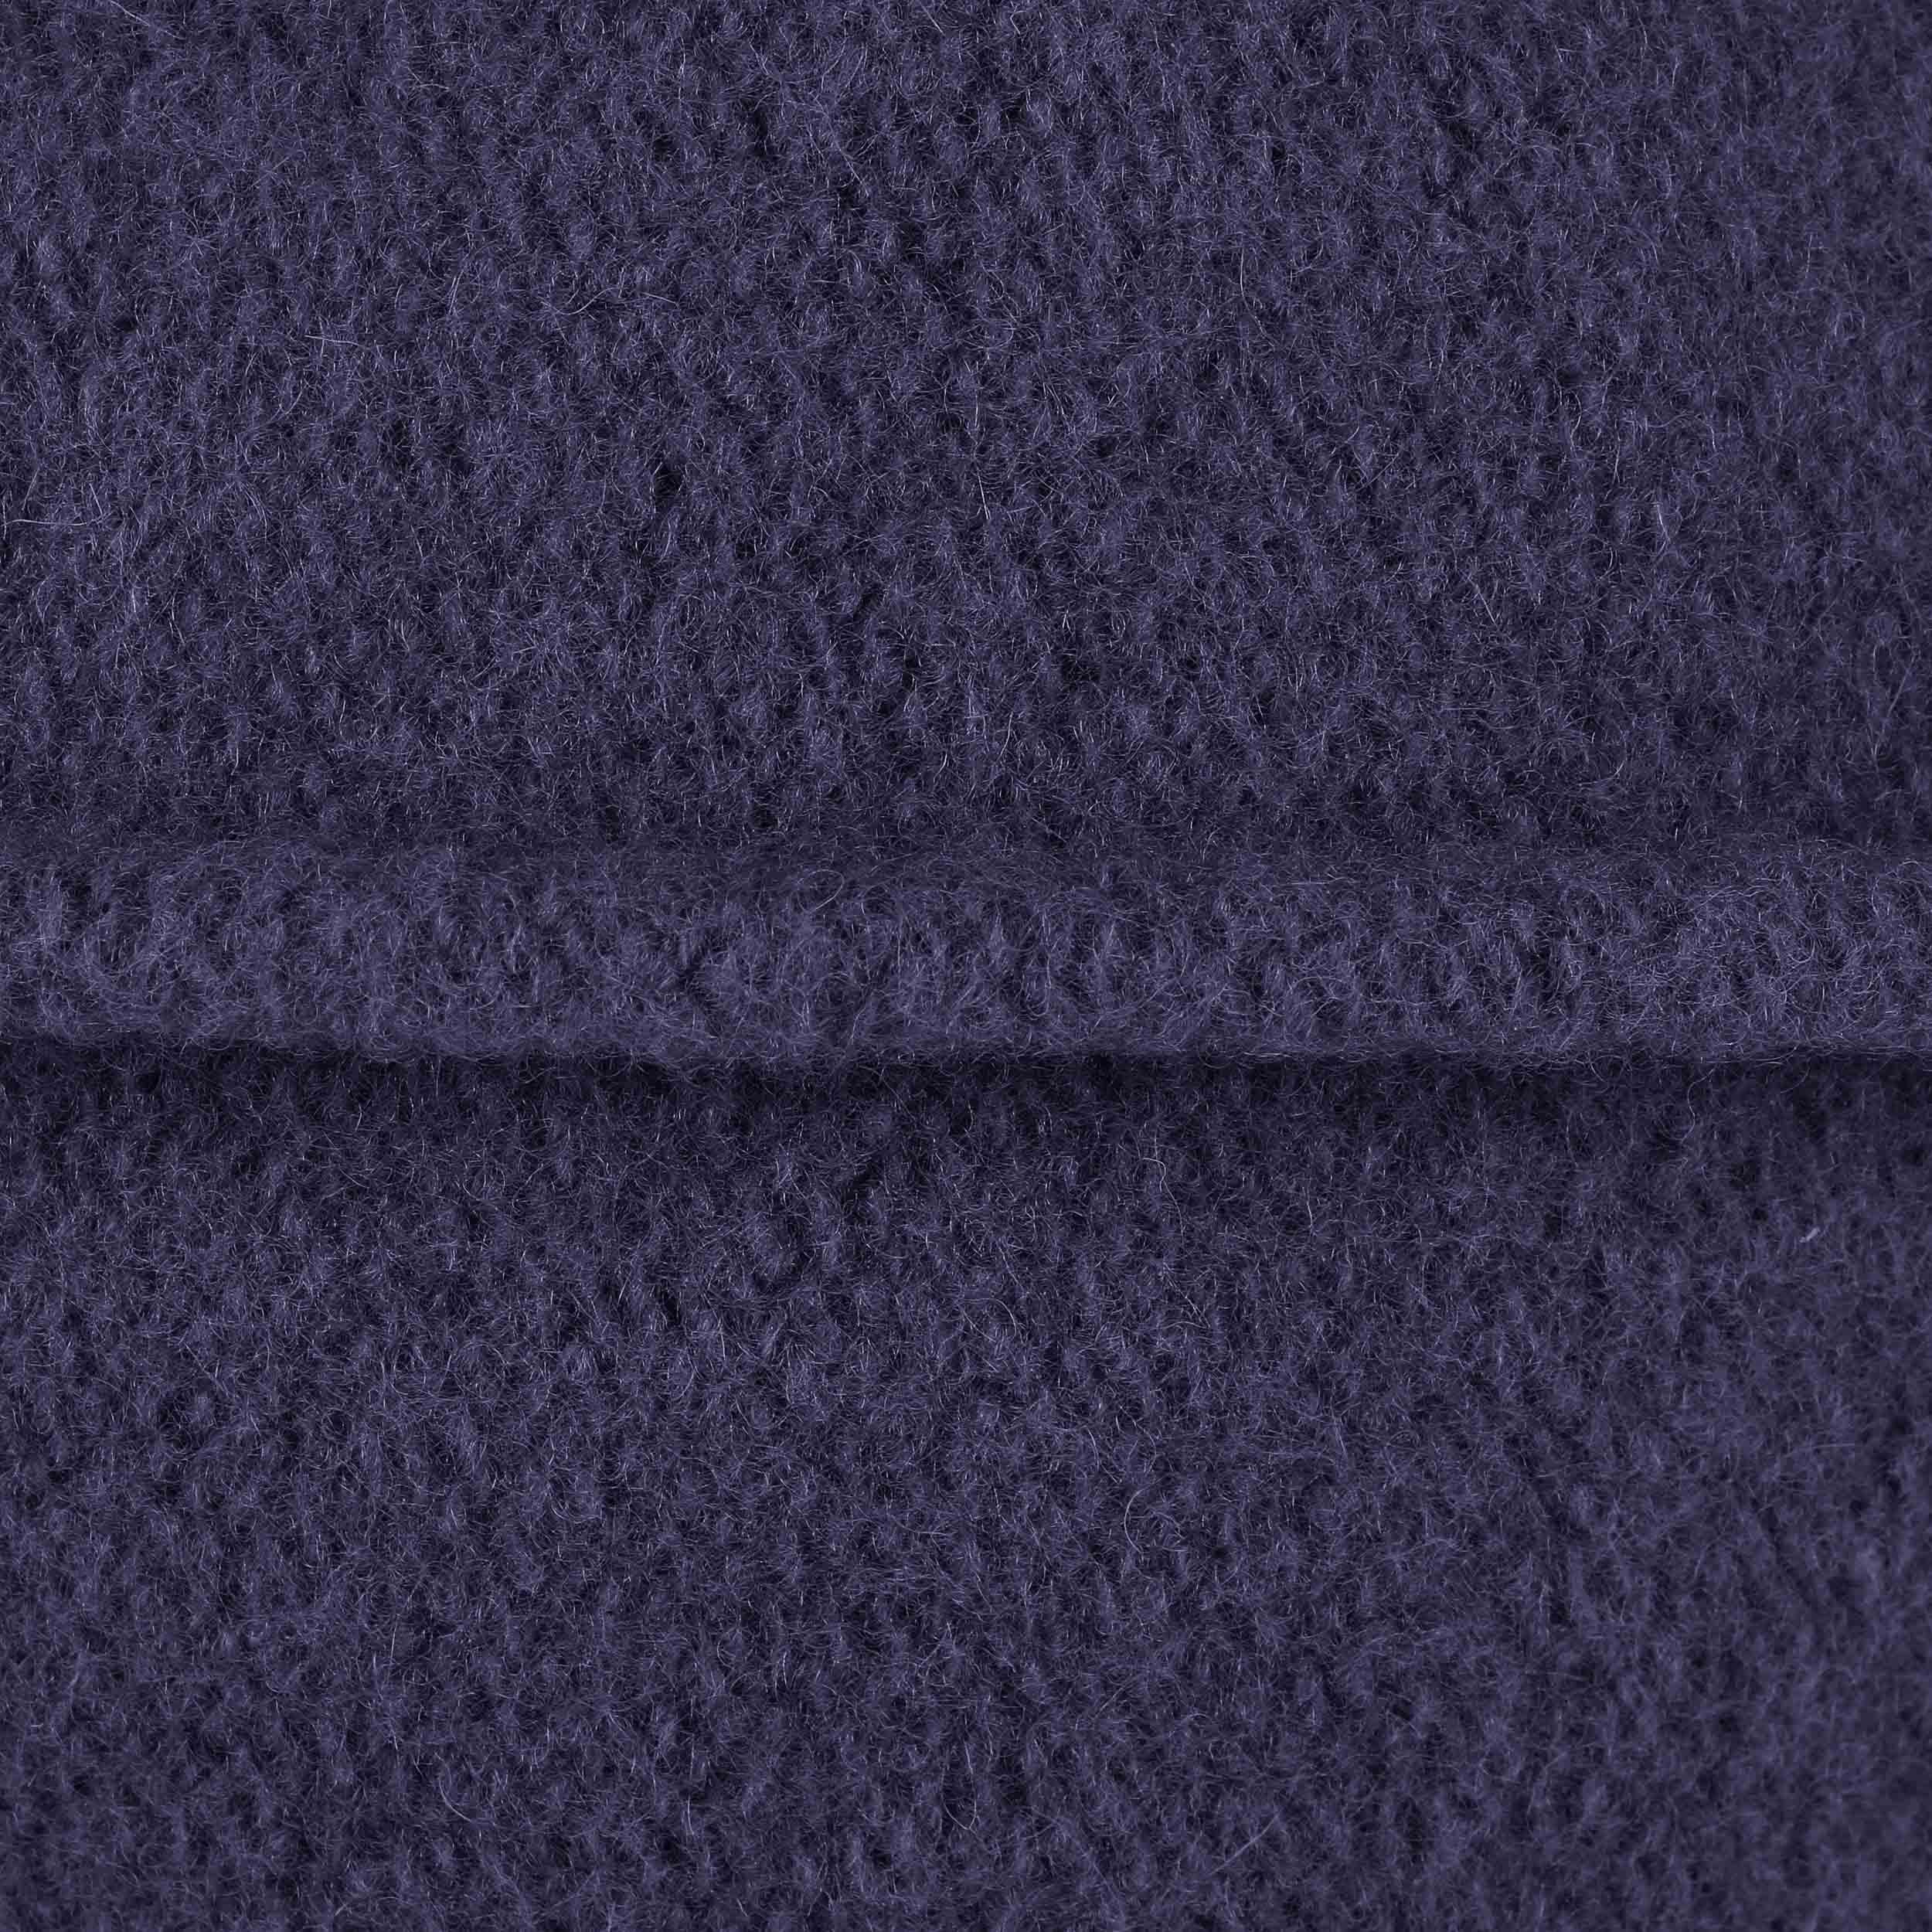 ... antracite 4 · Berretto in Lana Follata Slouchy by McBURN - blu scuro 4  ... 8be452dc4a9f